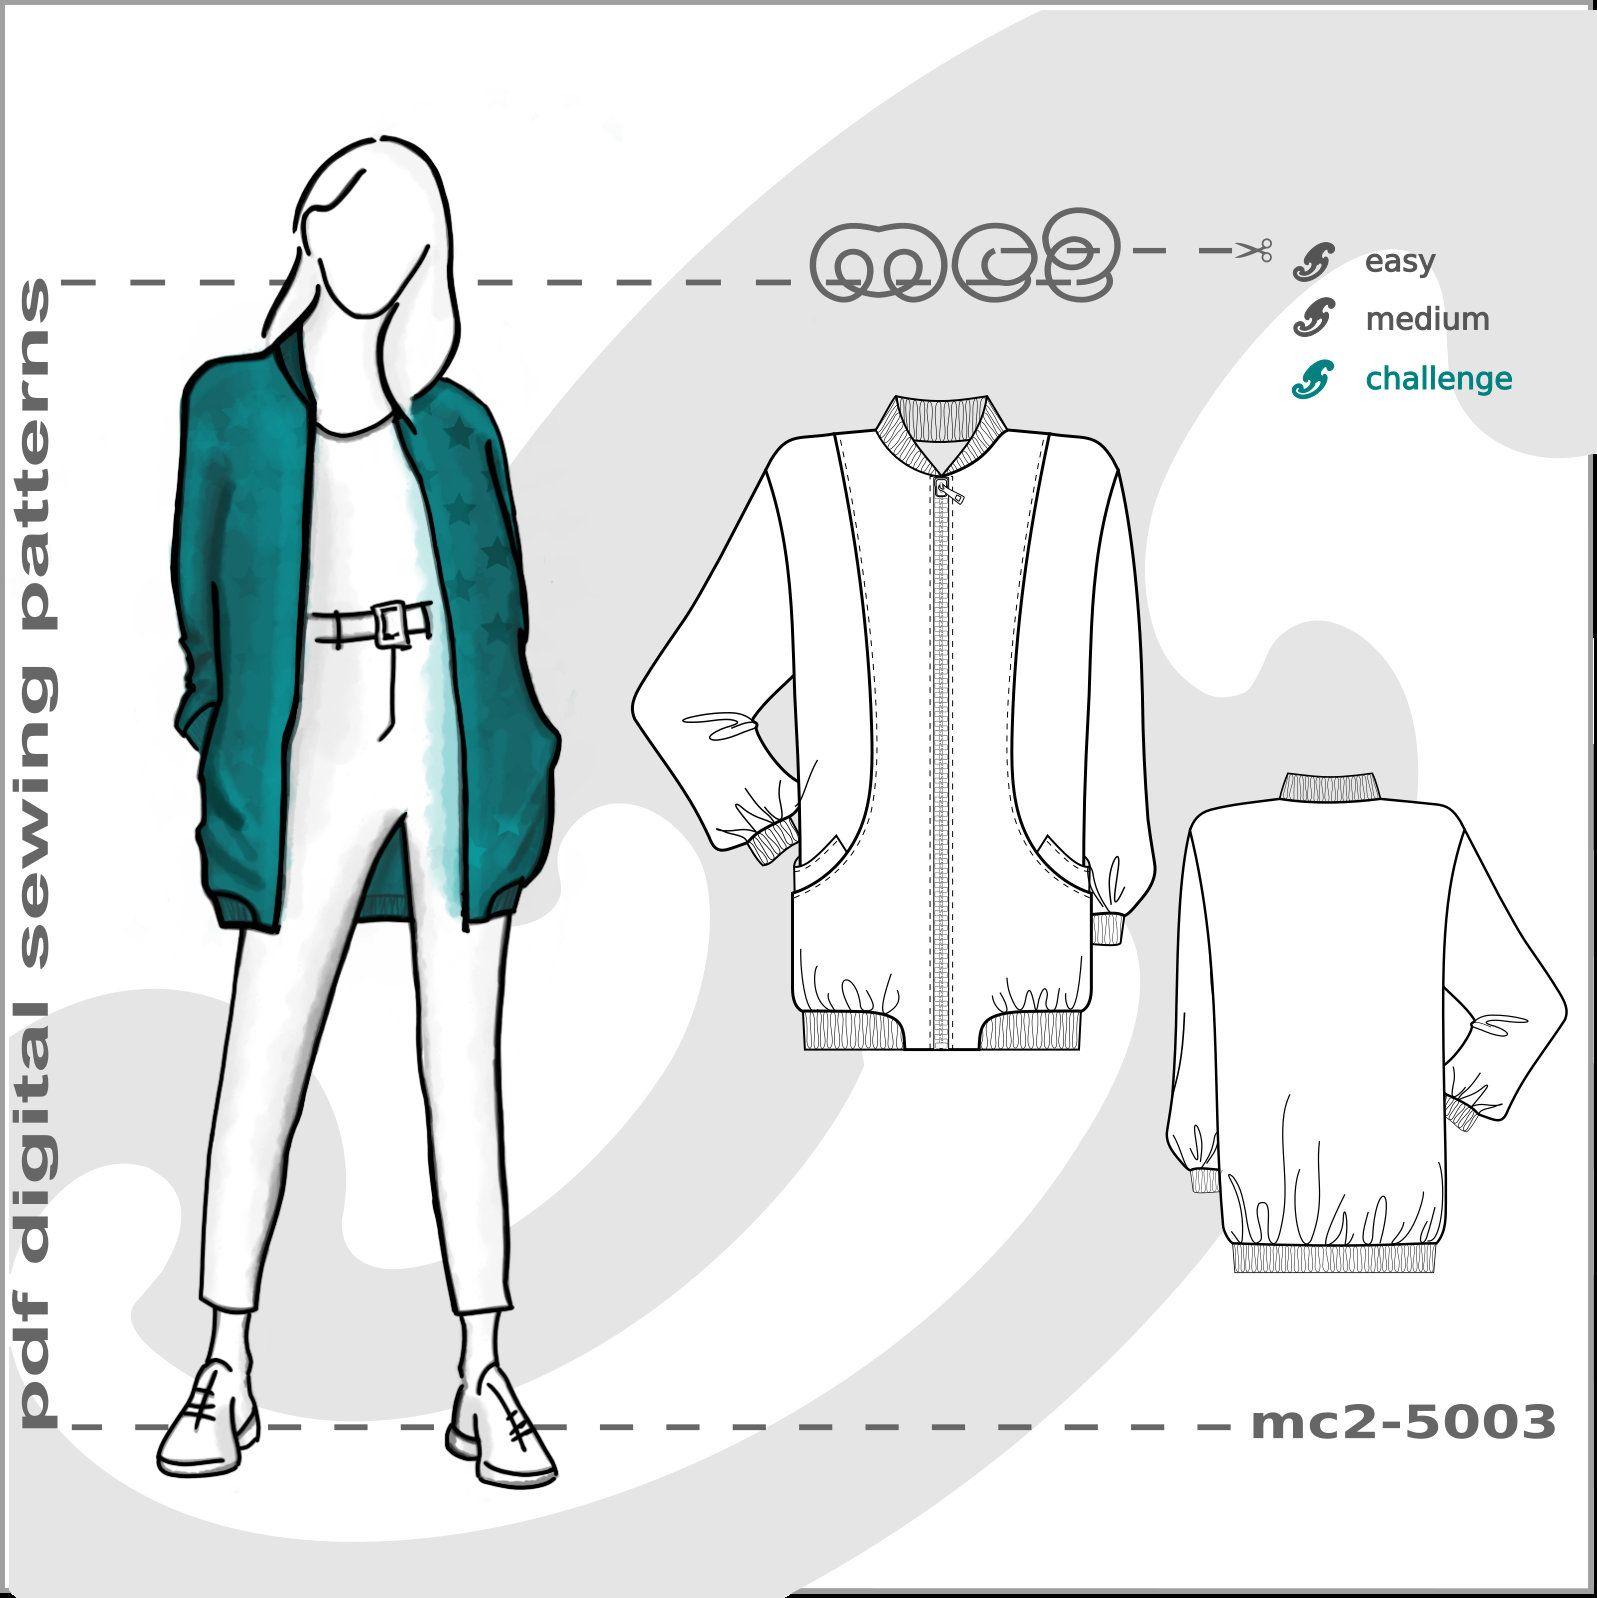 S M L Xl 2xl Bomber Jacket Hip Length Digital Pdf Sewing Pattern For Women Mc2patterns Mc2 5003 By Mc2p Jacket Pattern Sewing Bomber Jacket Trending Outfits [ 1598 x 1597 Pixel ]